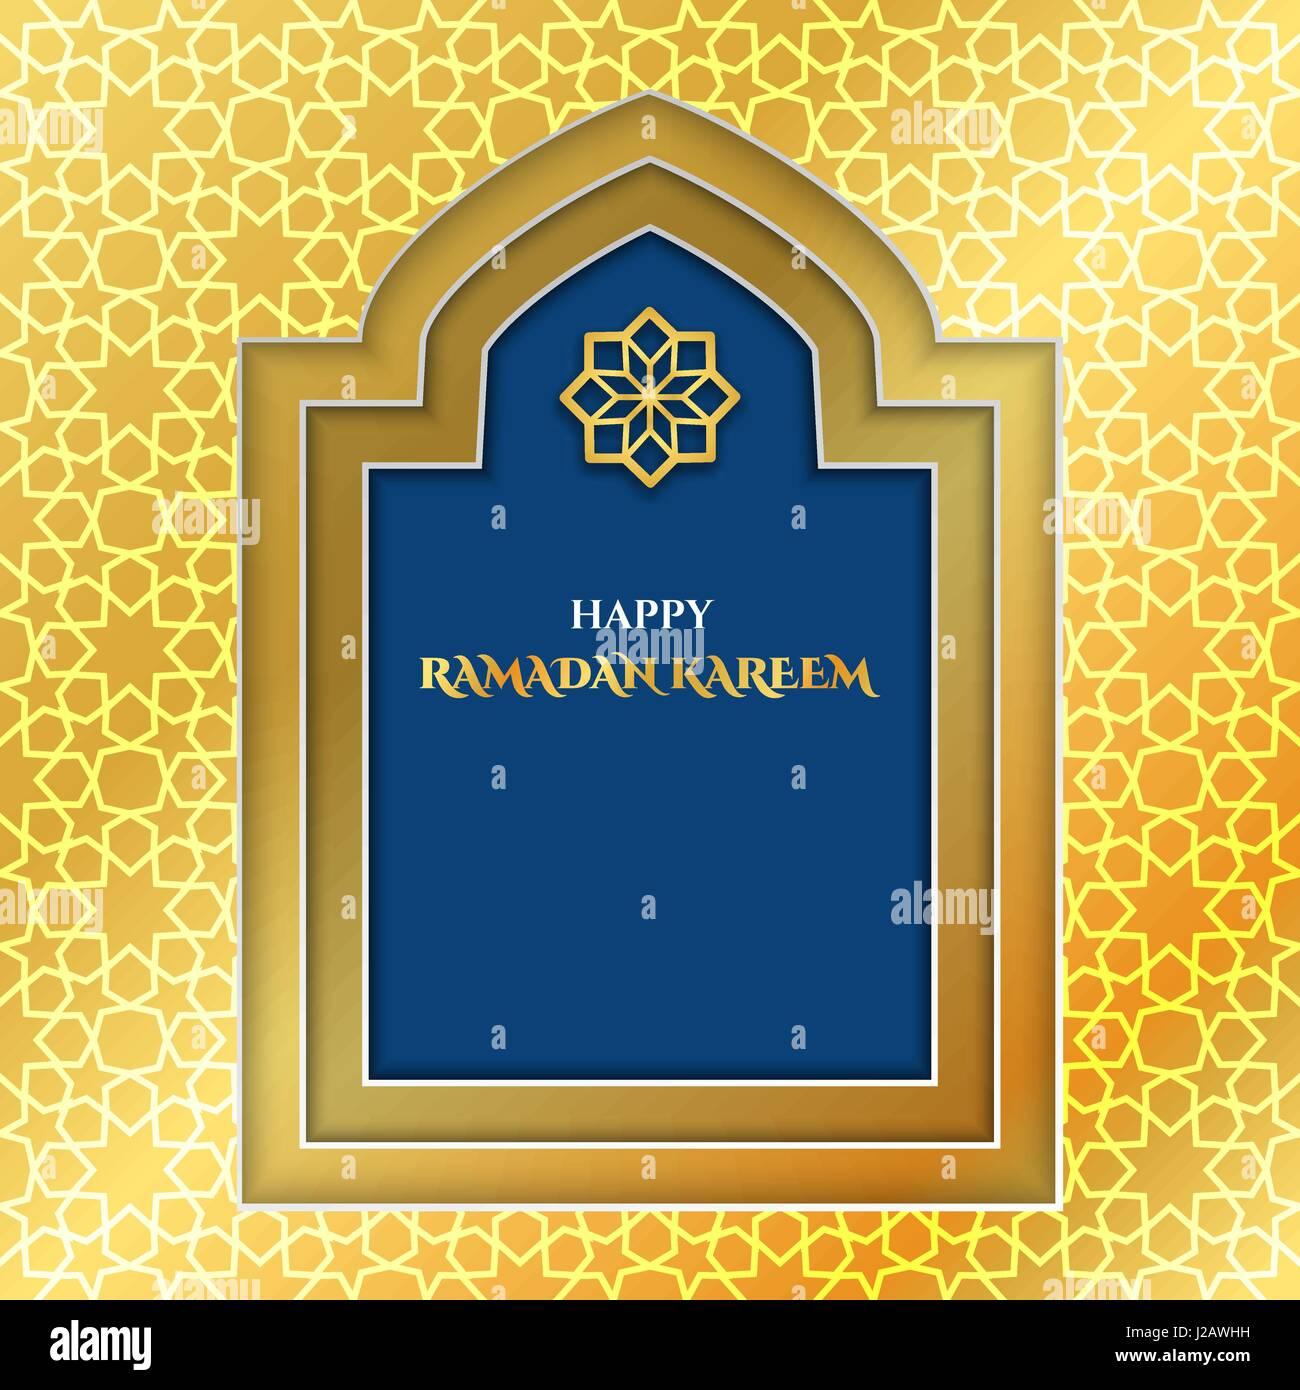 Vector Illustration Of Ramadan Kareem For Design Website Stock